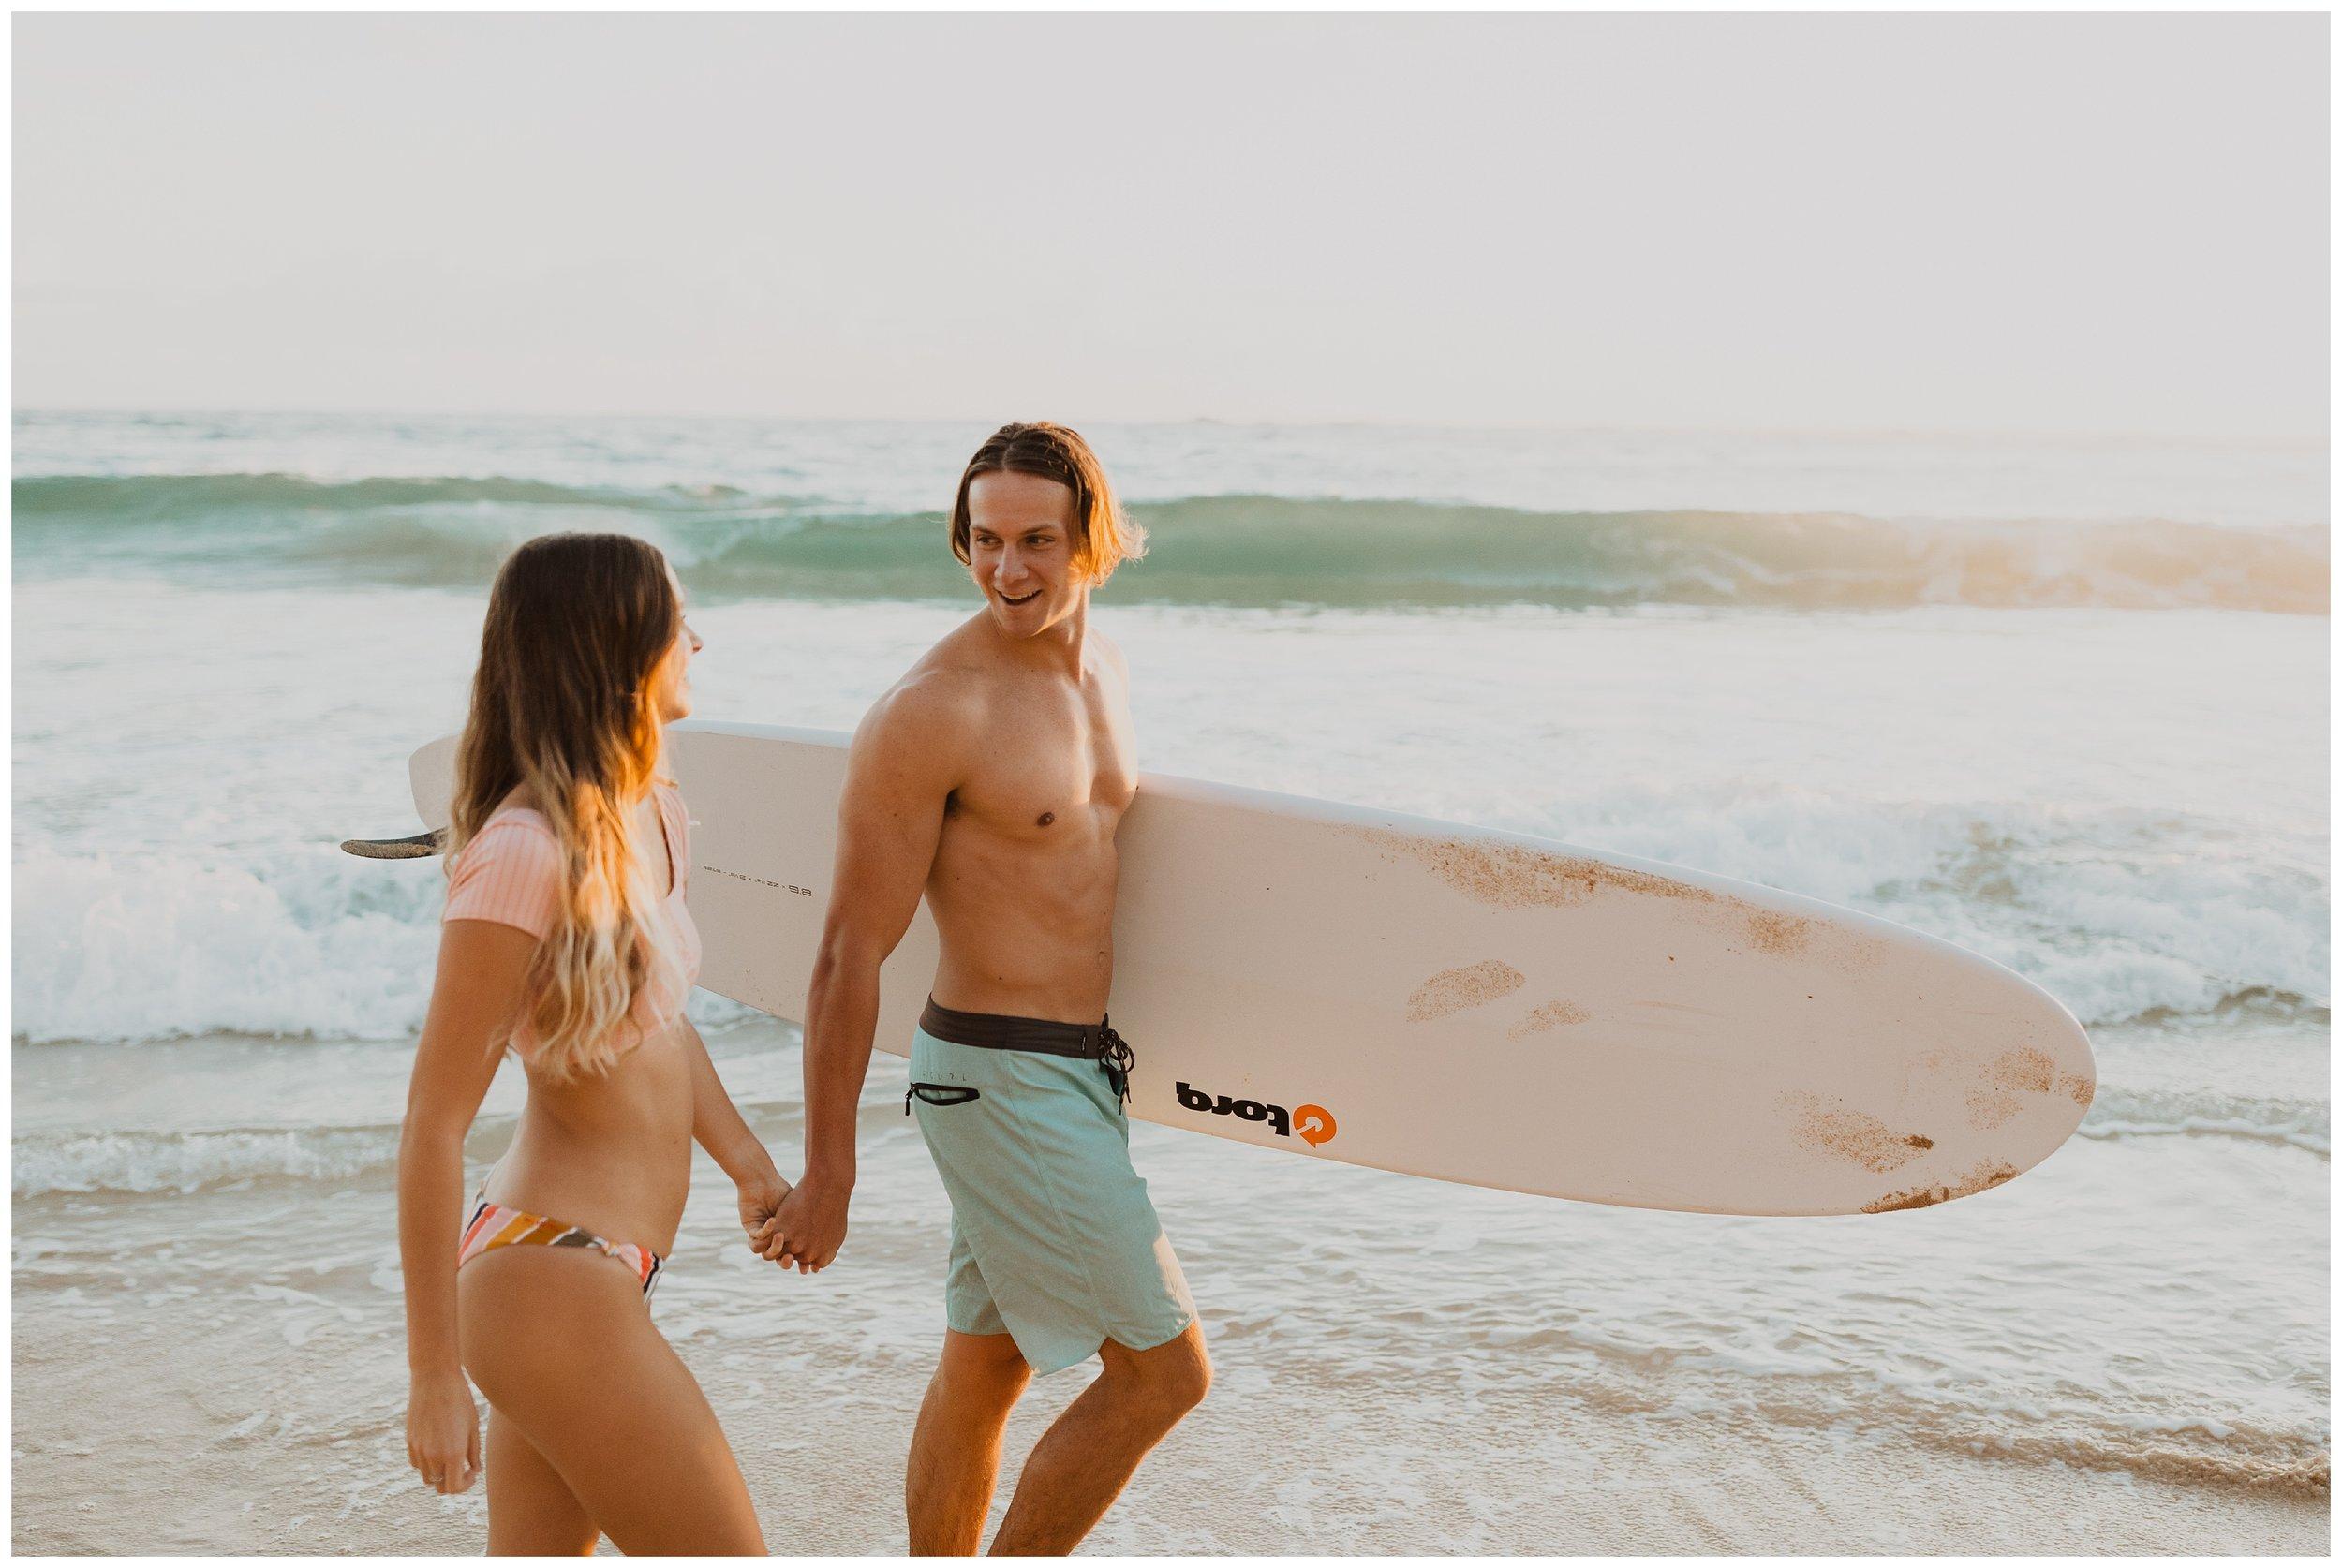 Meg's Marvels Photography - North Shore Oahu Hawaii Surfer Couples Photo Session_0200.jpg